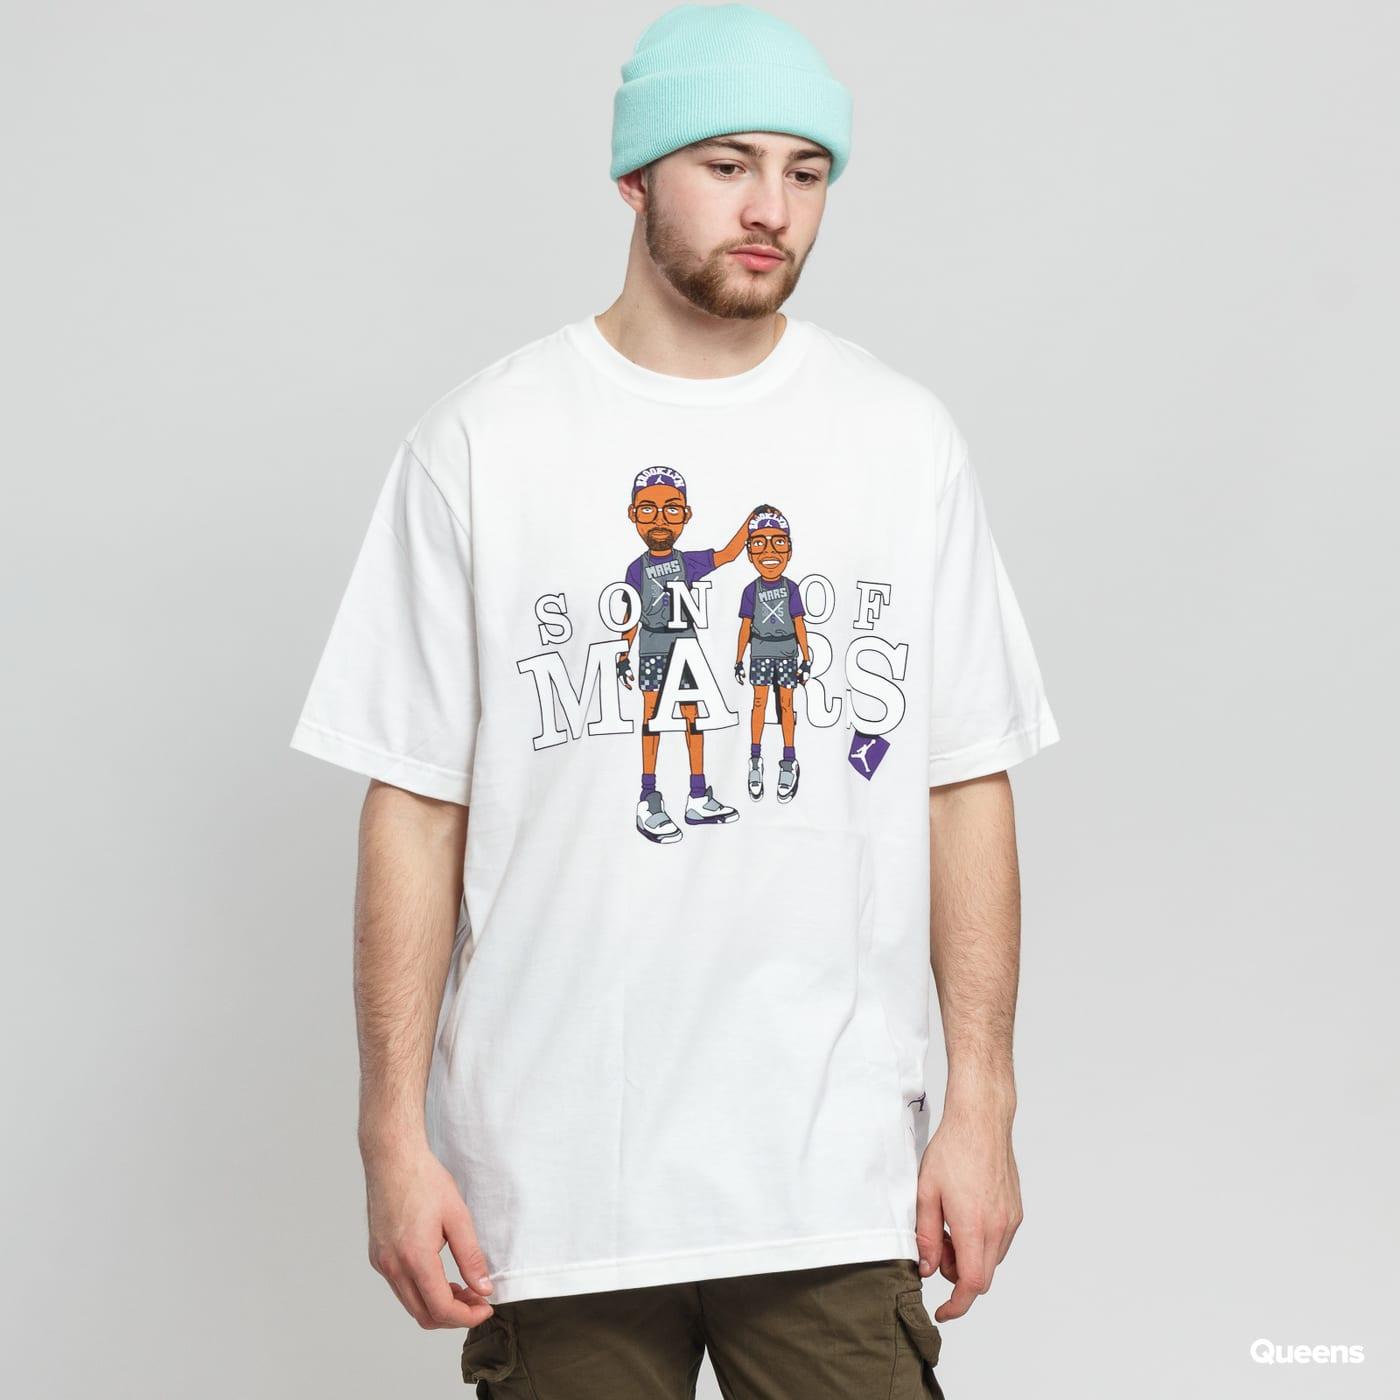 Tričko s krátkým rukávem Jordan Air Jordan Son Of Mars Poster Tee IC  (465123-100) – Queens 💚 fb191774ca